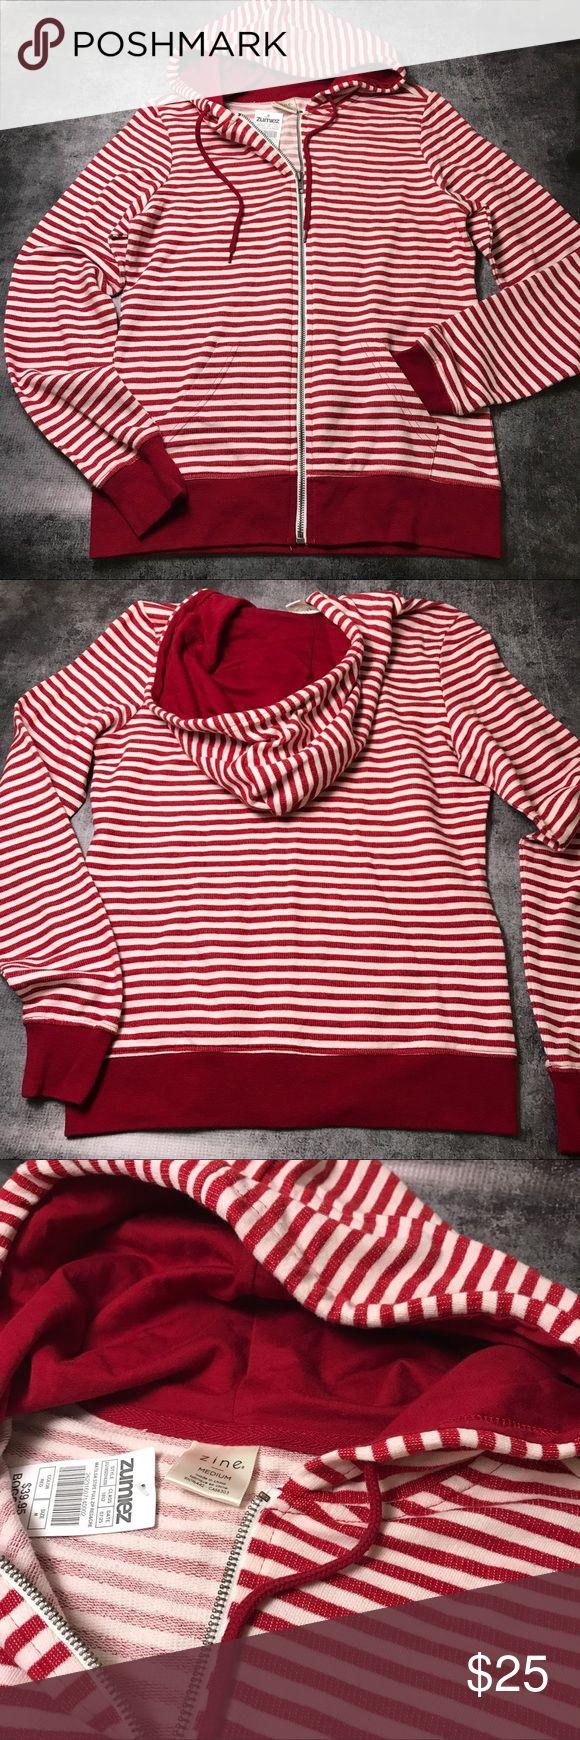 NEW Striped Zip-up Hoodie •NEW •Striped in red and white •Medium weight Zumiez Tops Sweatshirts & Hoodies